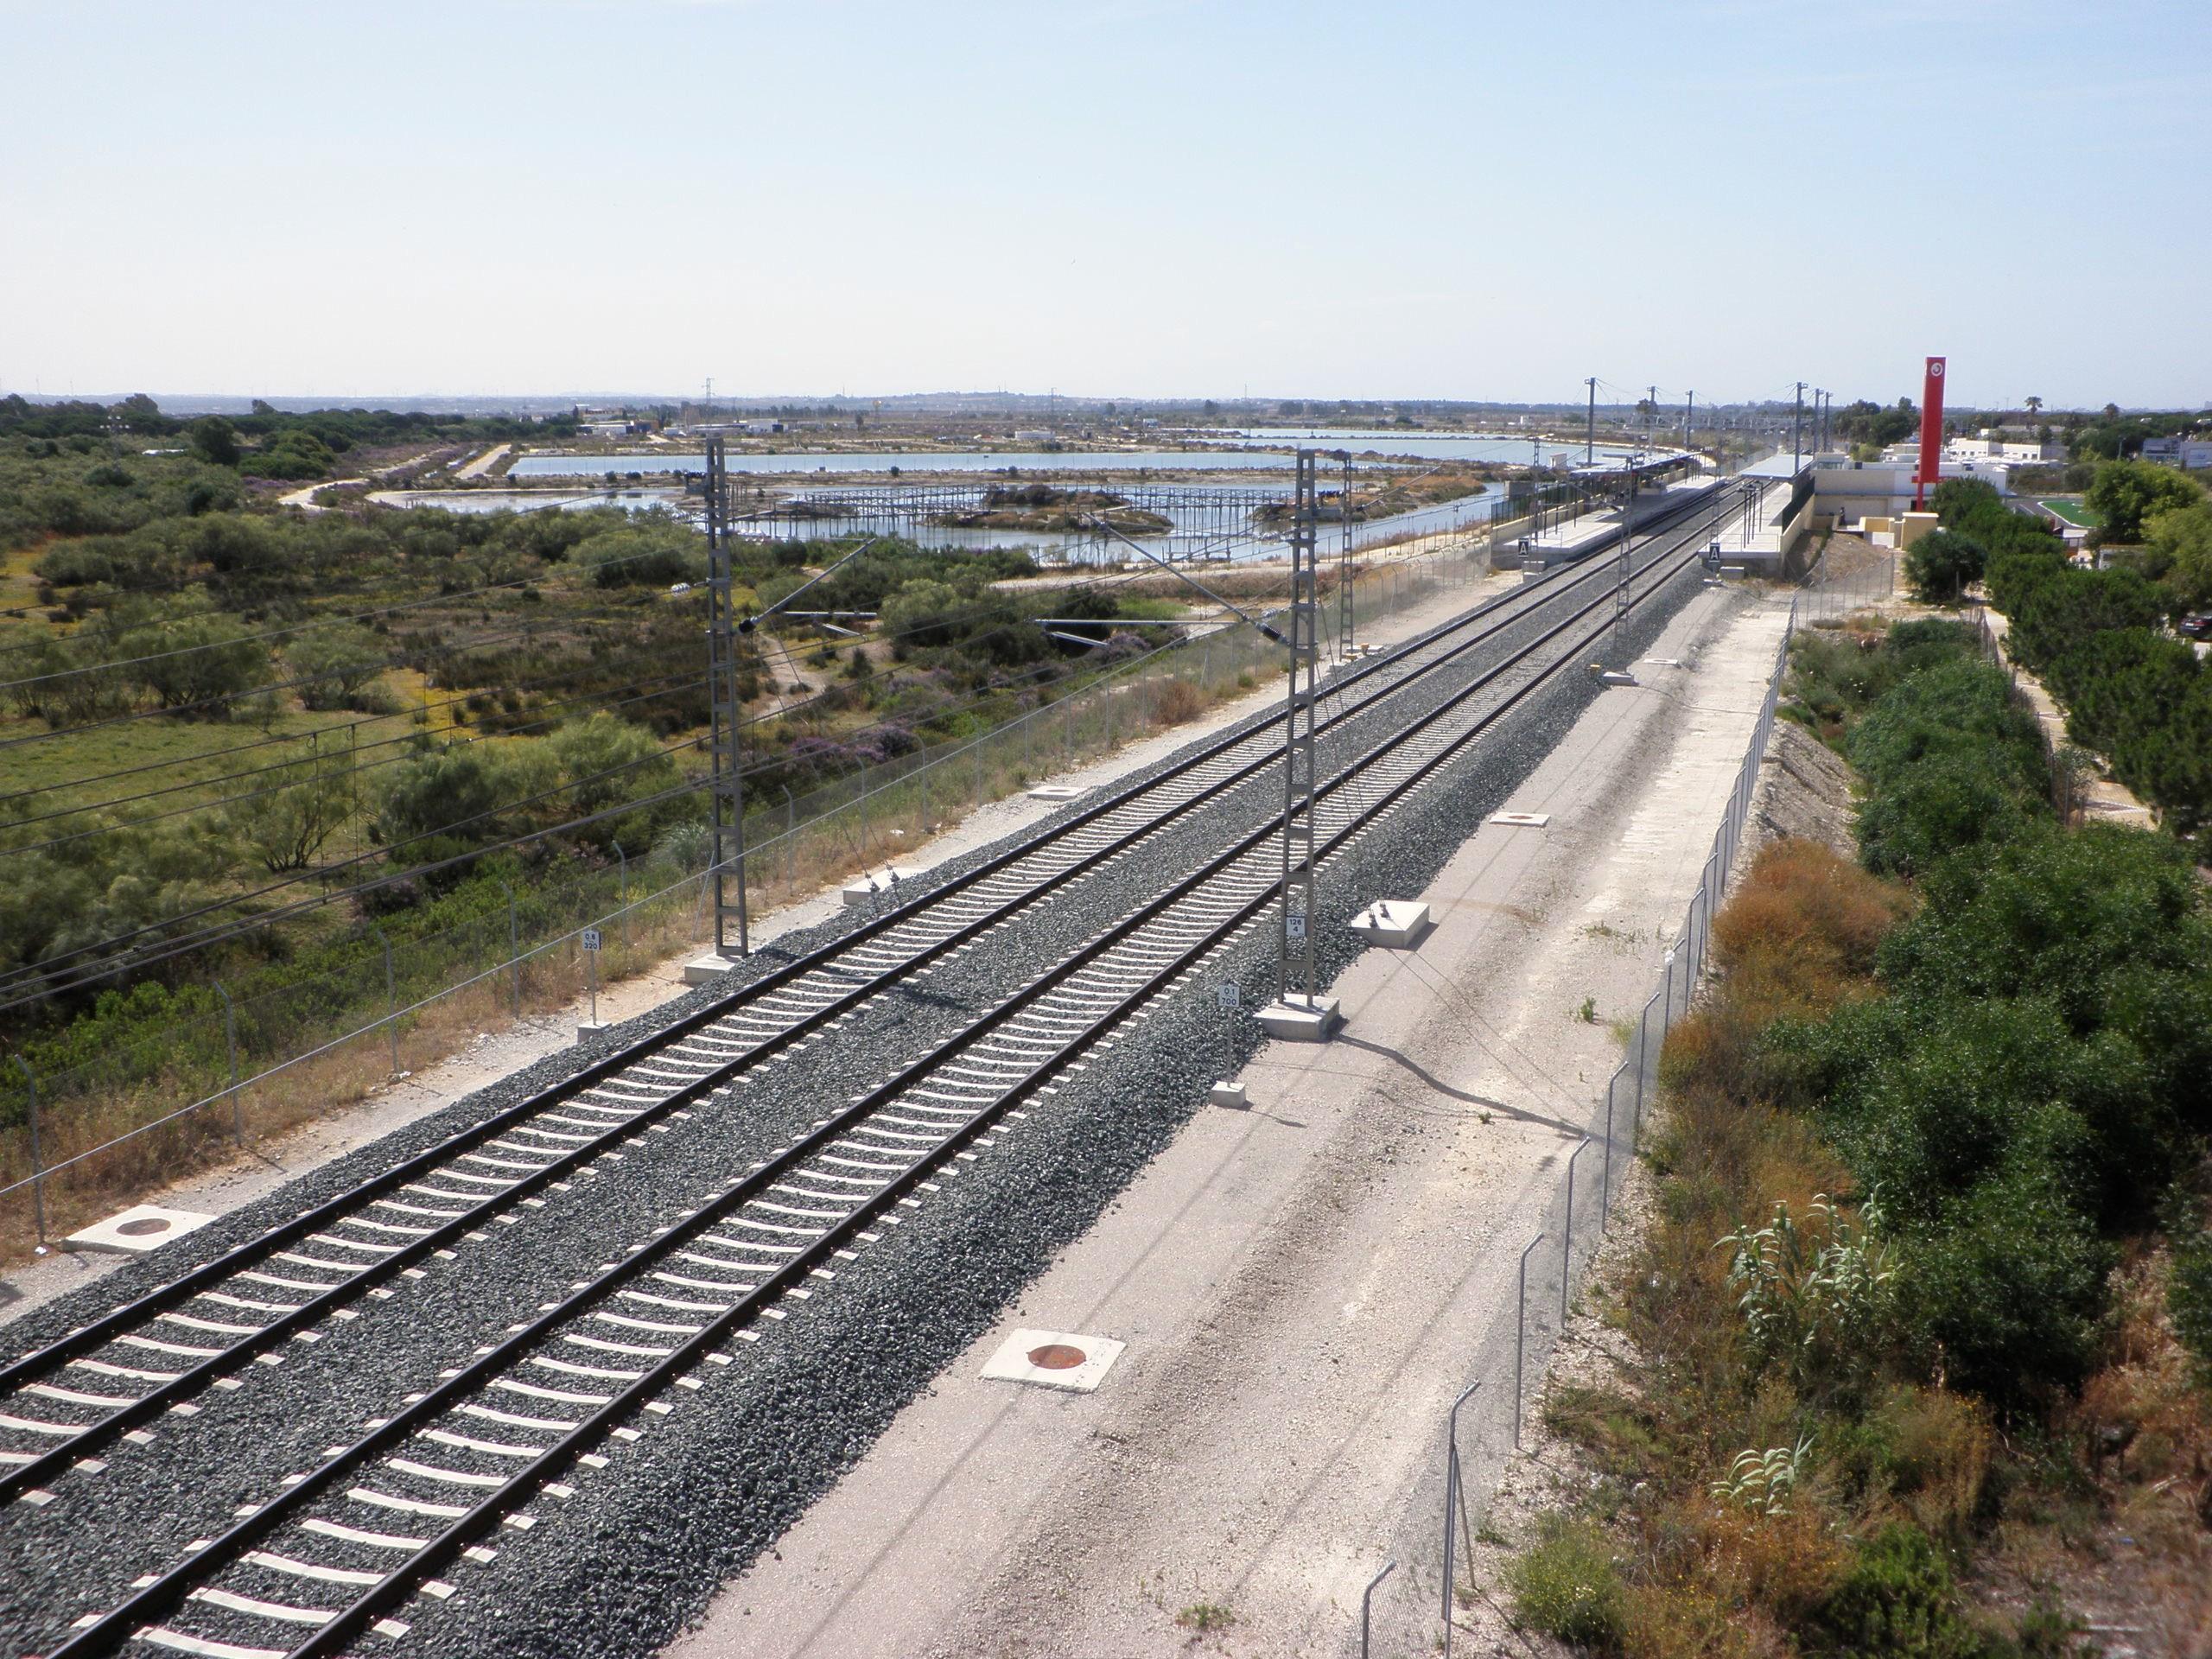 el puerto de santa maria mature singles Wta madrid scores on flashscorecom offer livescore, results and wta madrid draws.